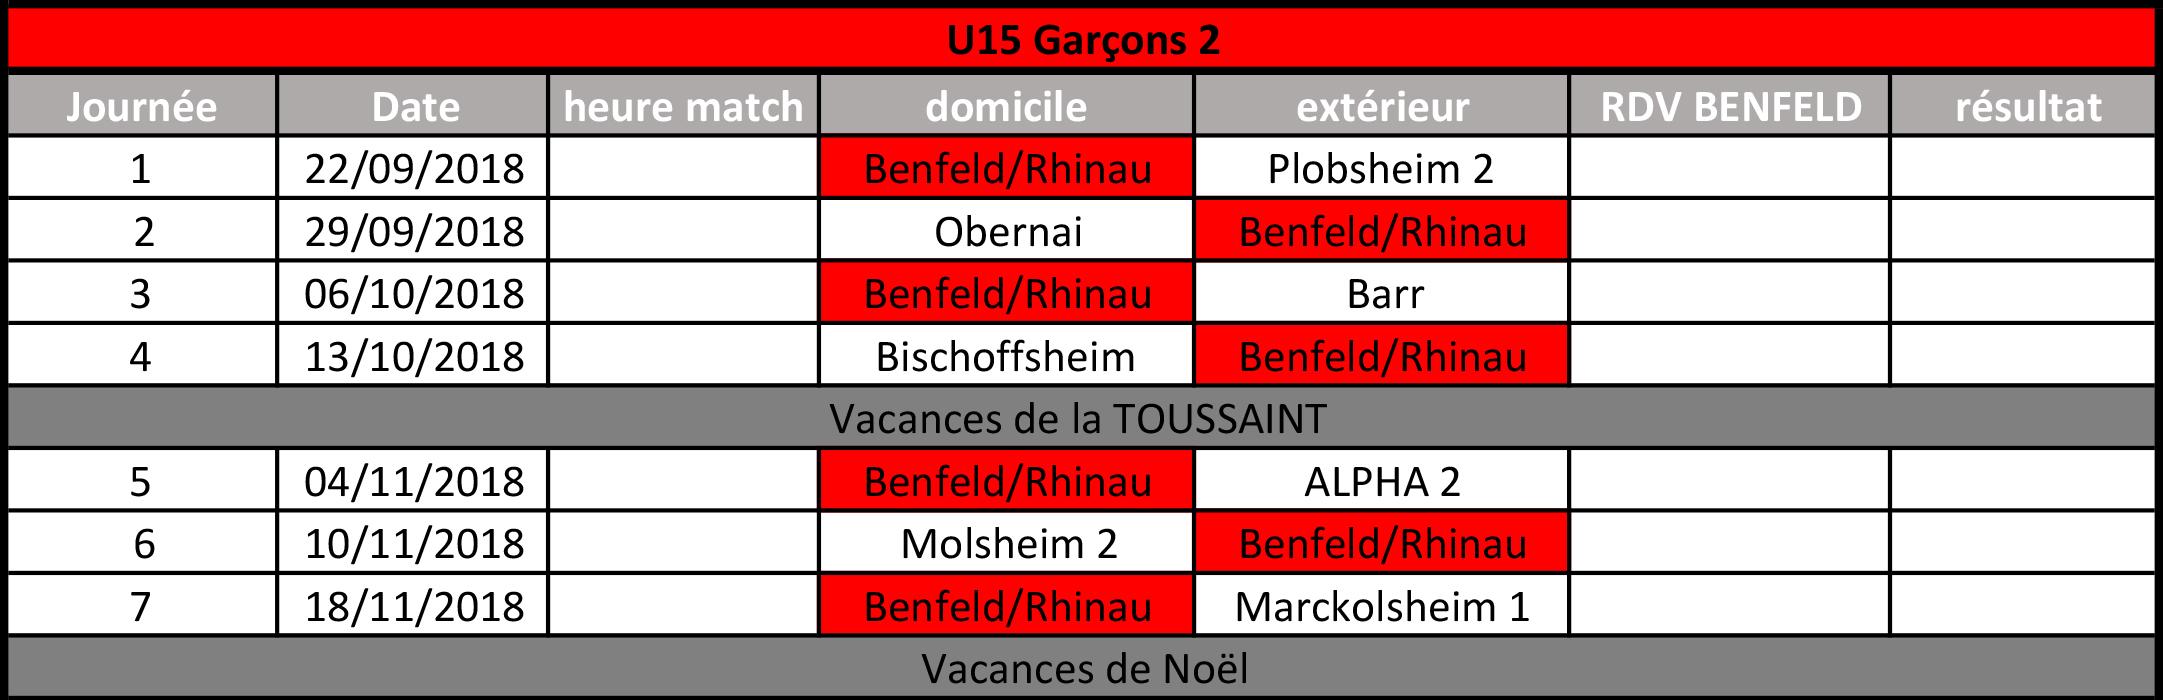 Calendrier U15 Garçons 2.jpg